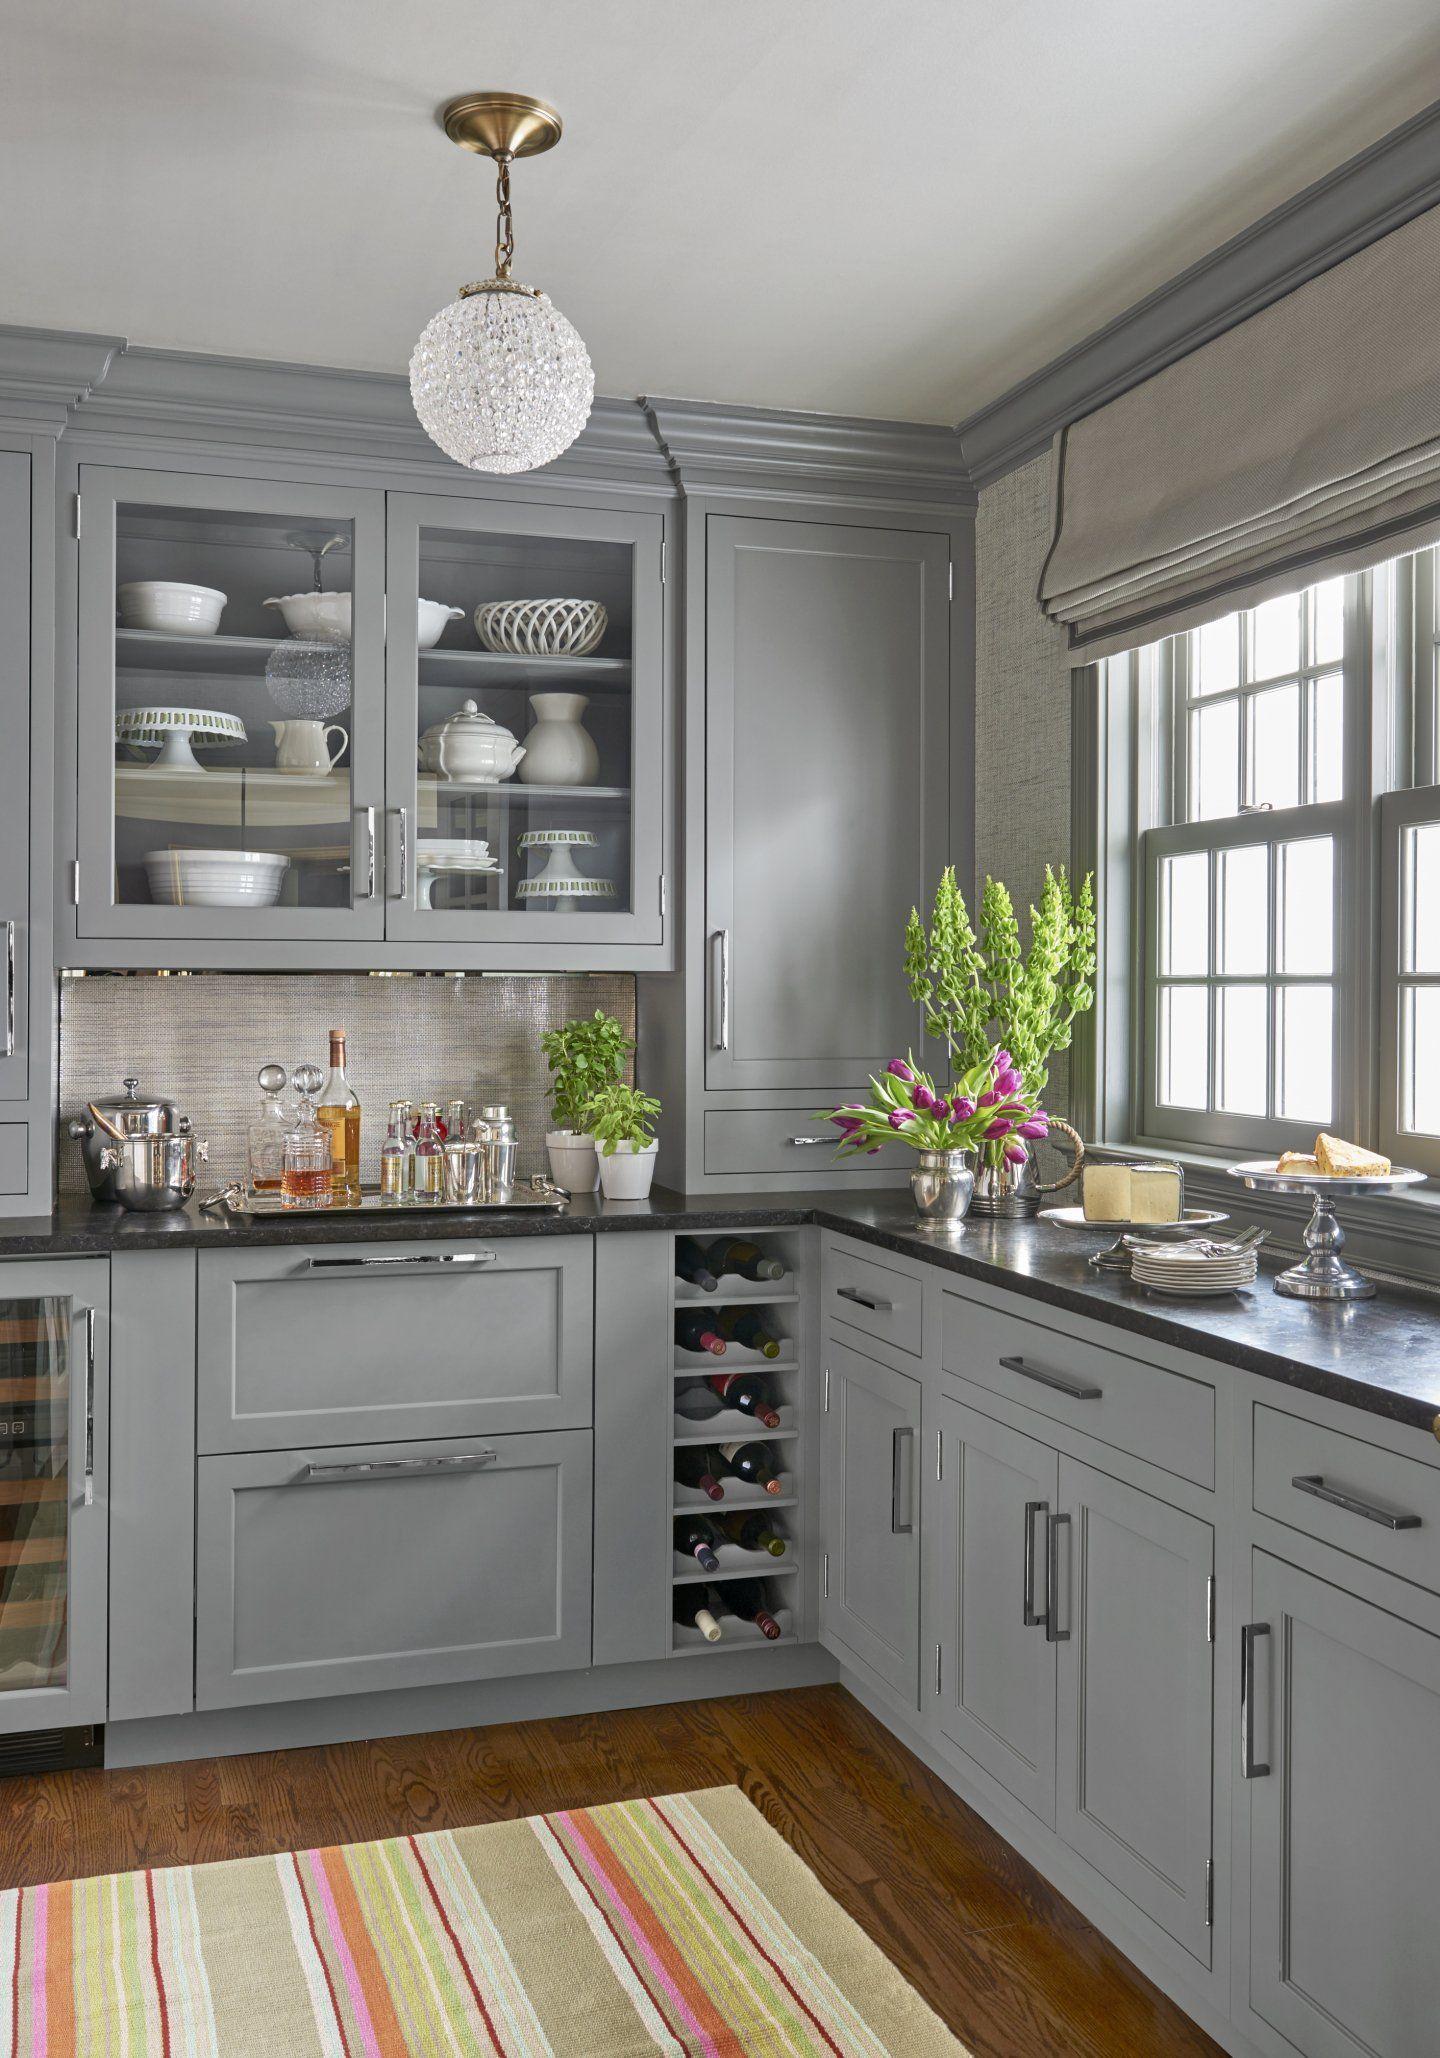 S kitchen turned major multitasker kitchens pinterest